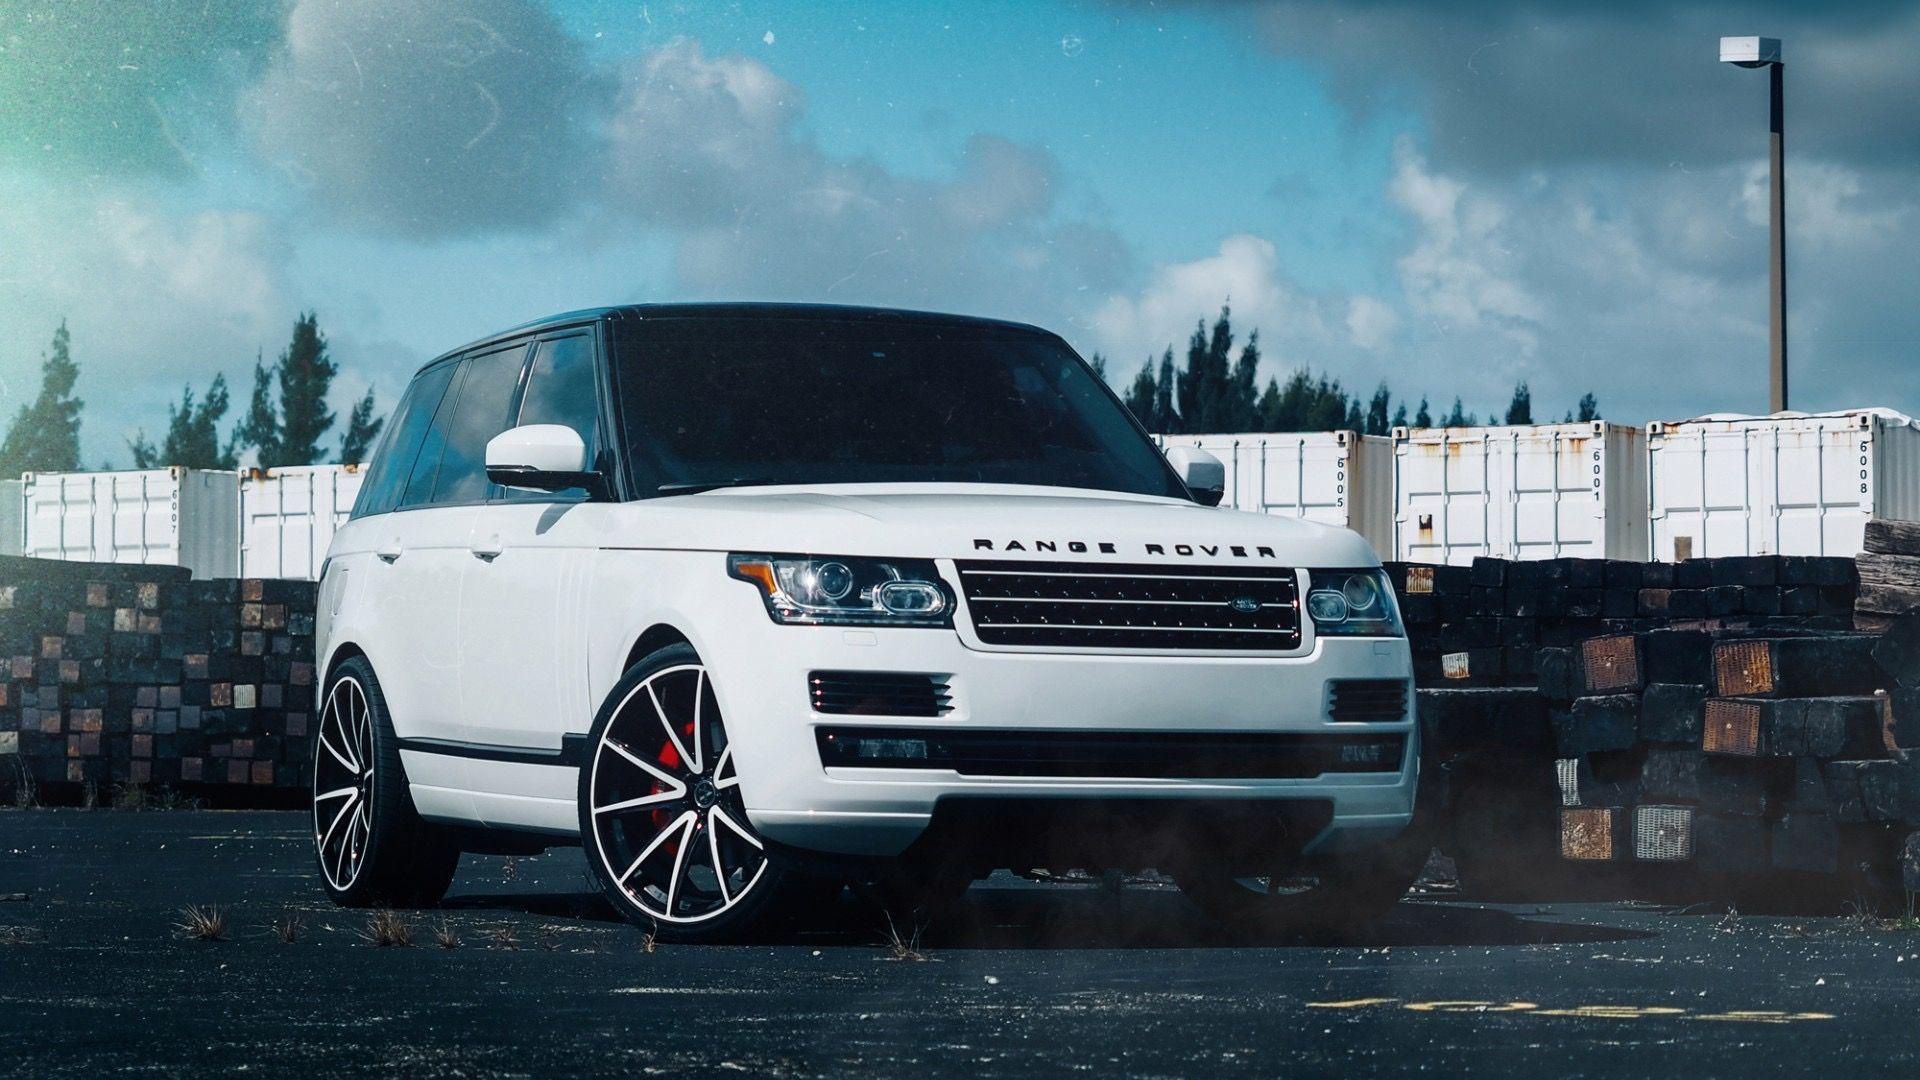 Range Rover 1080p picture